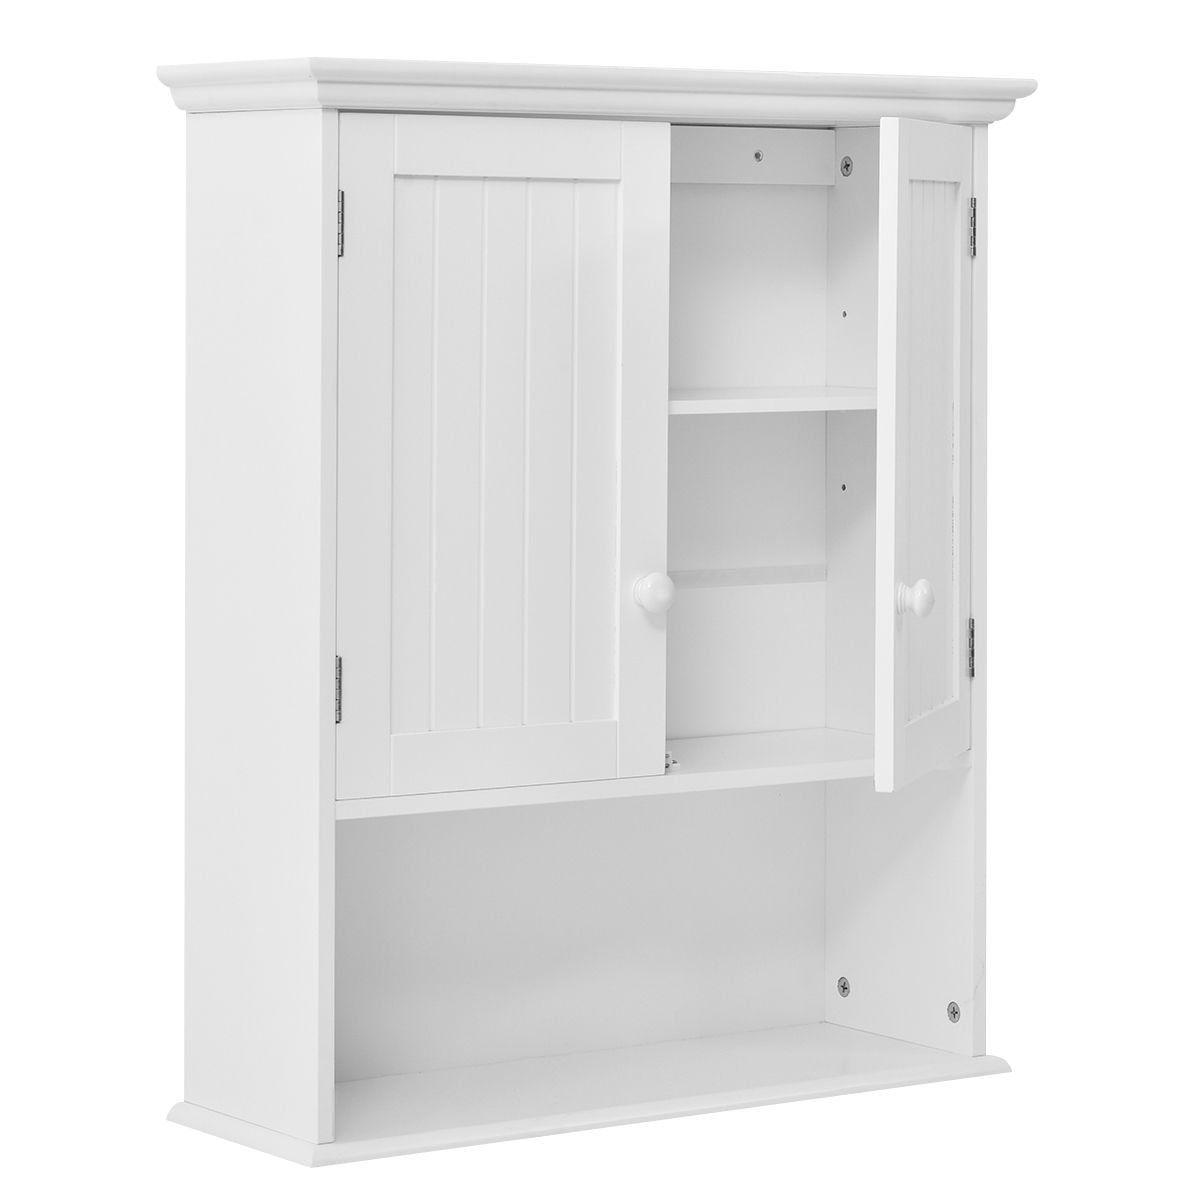 Wall Mount Bathroom Cabinet Storage Organizer | Wall Mounted ...